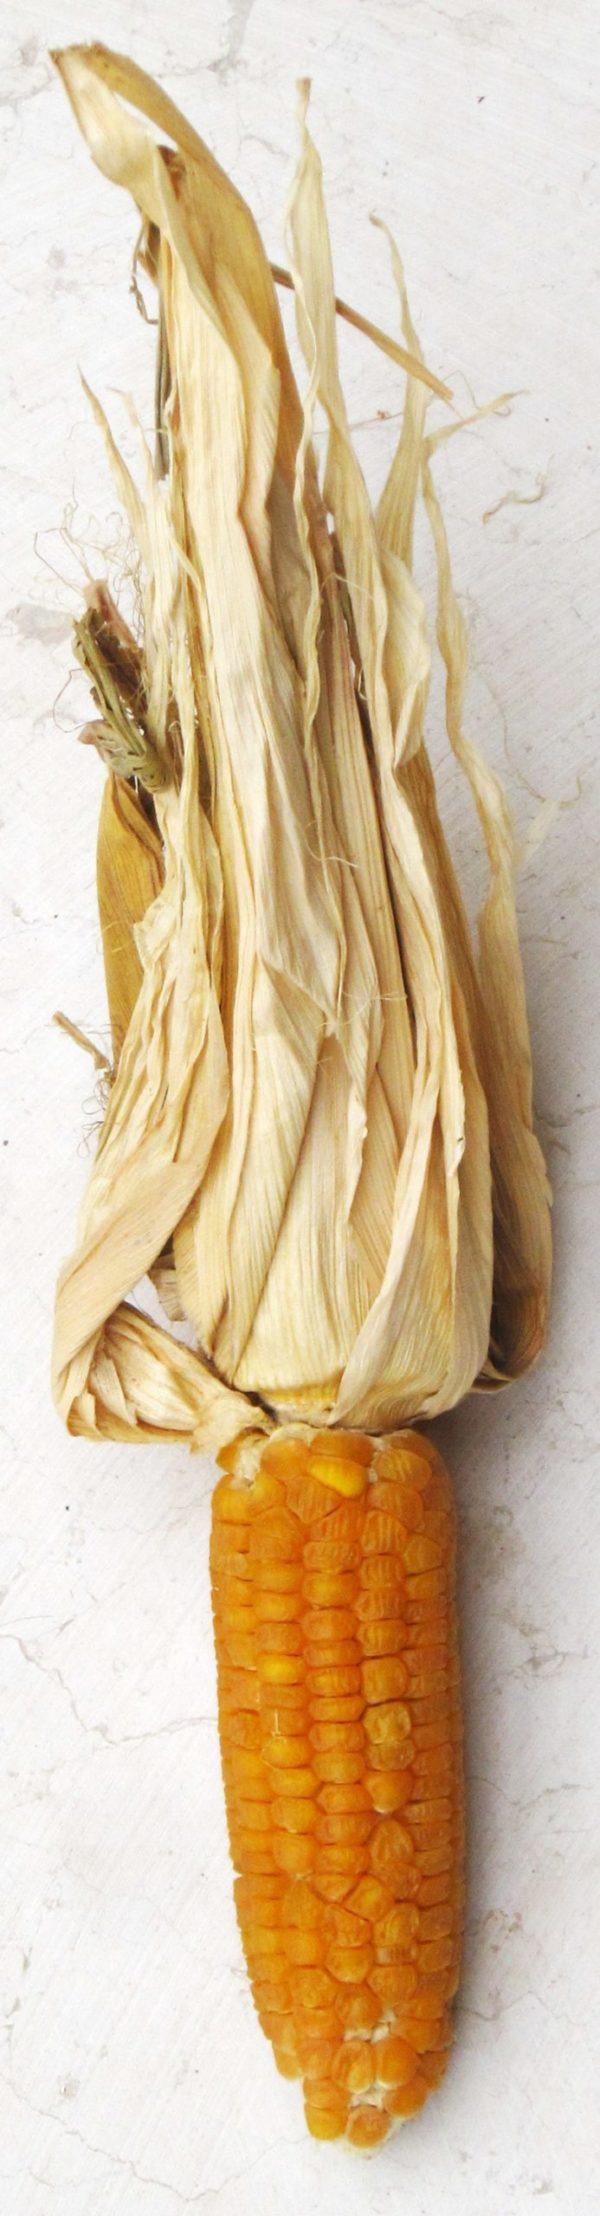 Golden Bantam Mais Saatgut-5655